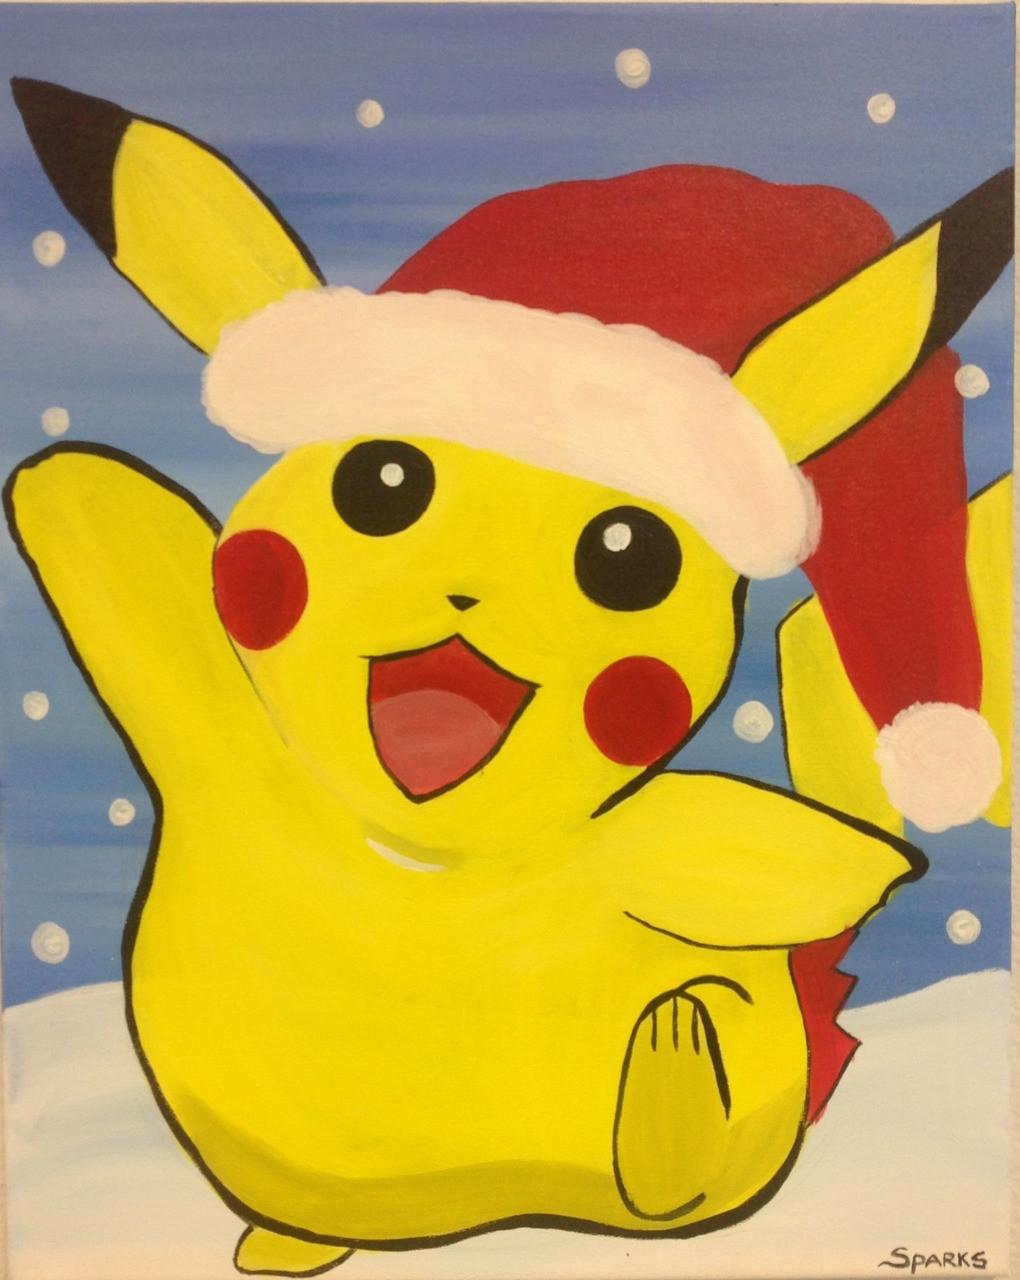 Christmas Paintings For Kids.Sparks Art For Kids Christmas Pikachu